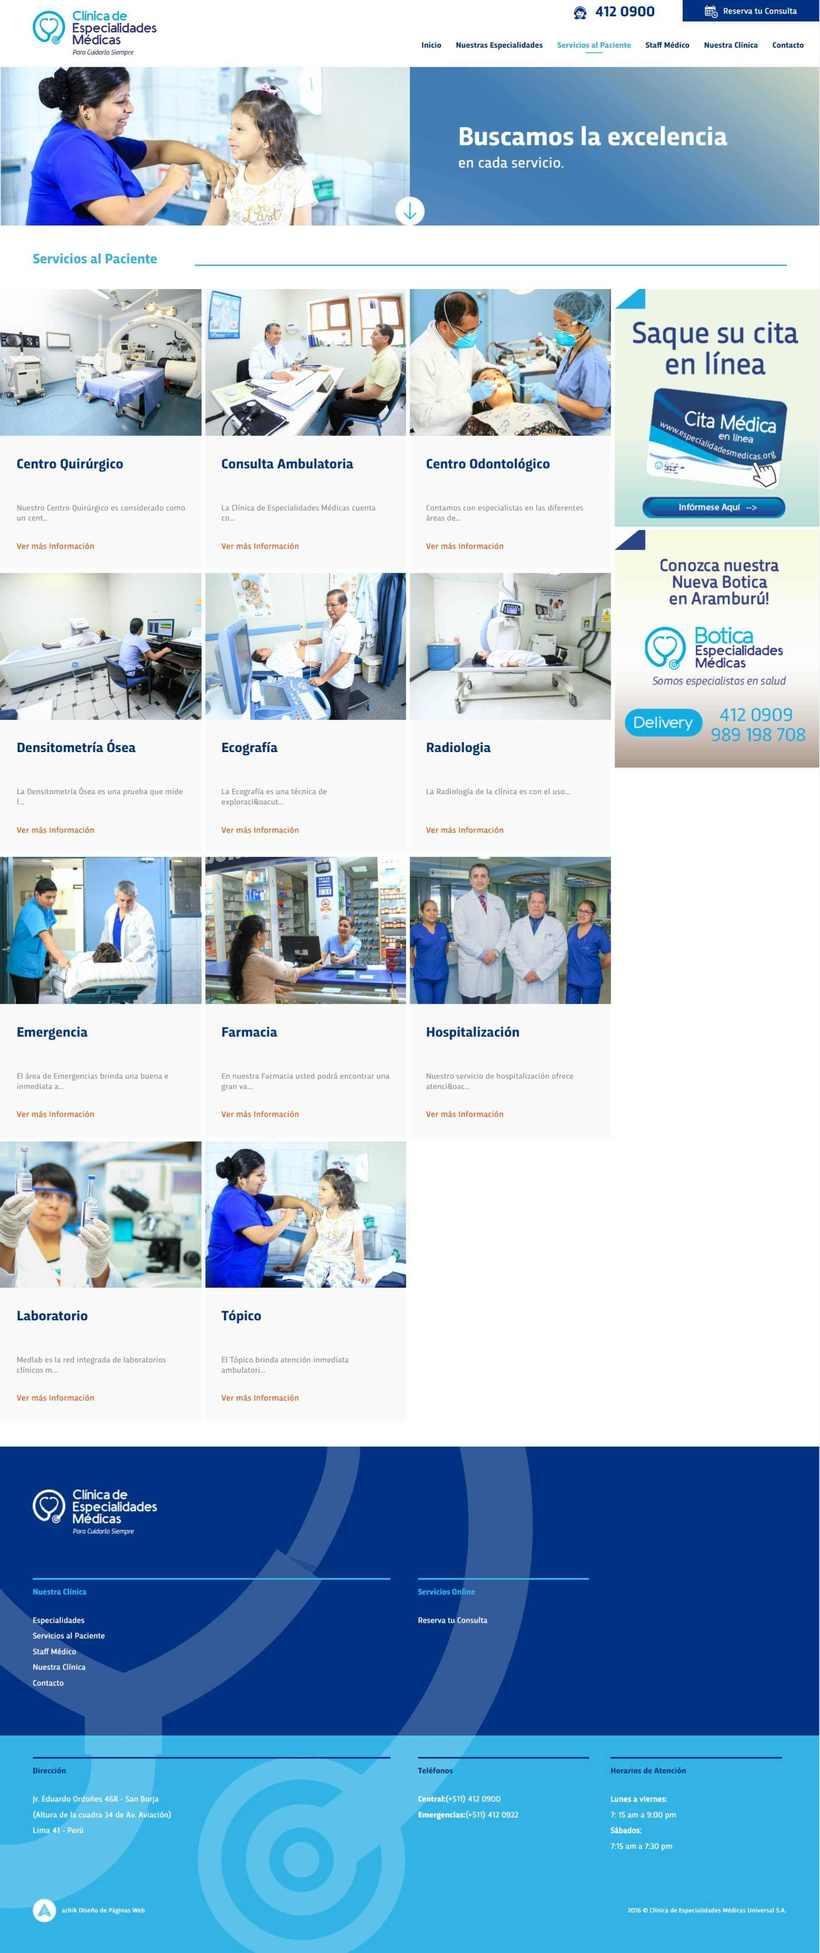 Clínica Especialidades Médicas 2